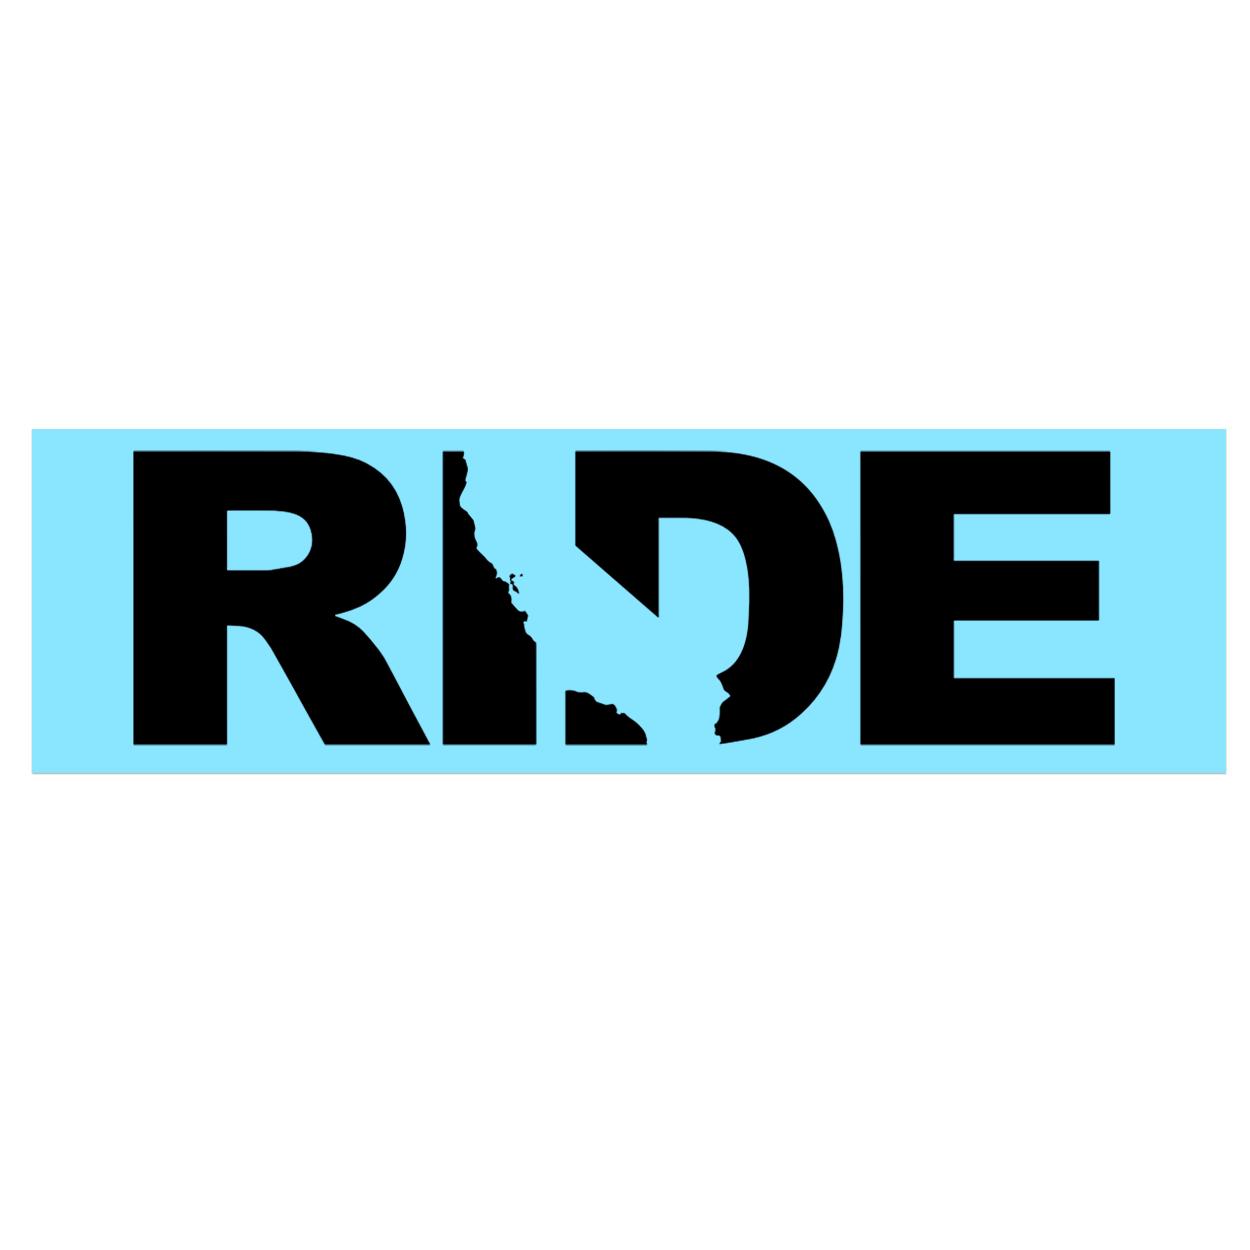 Ride California Classic Decal (Black Logo)